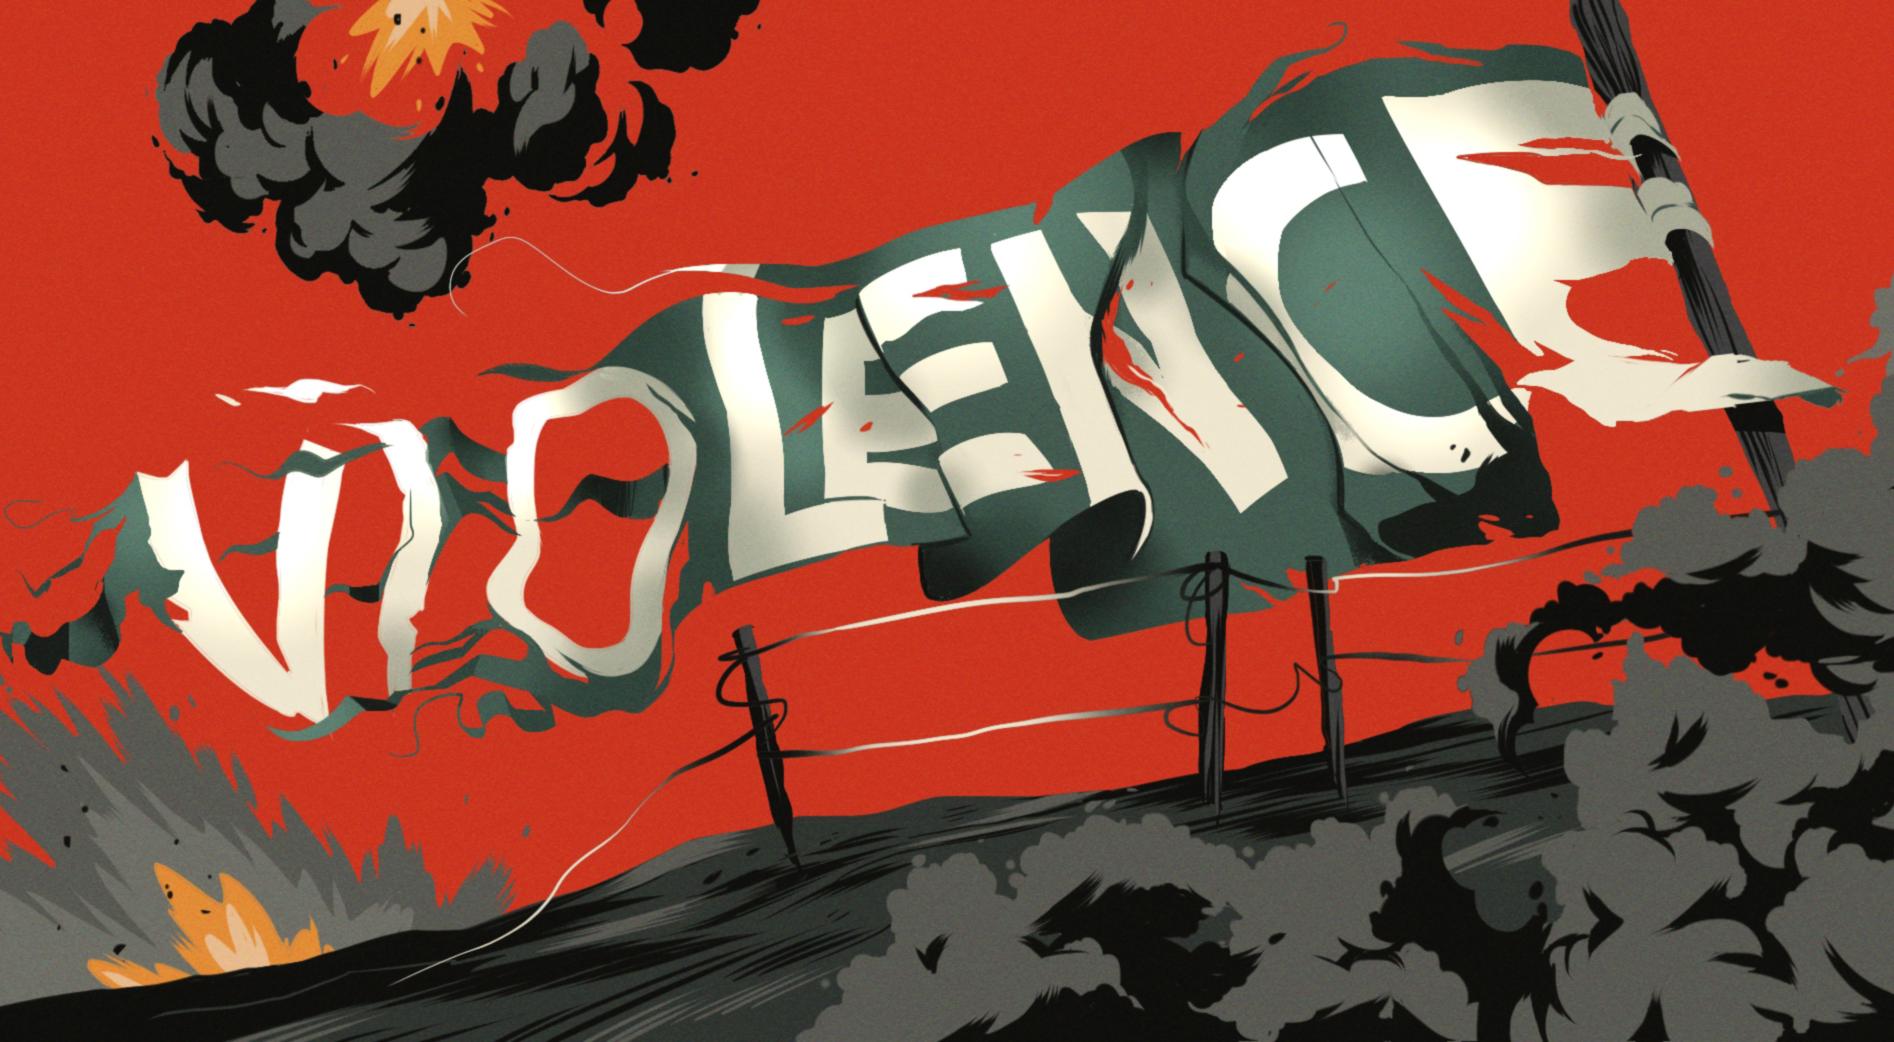 Violence 1